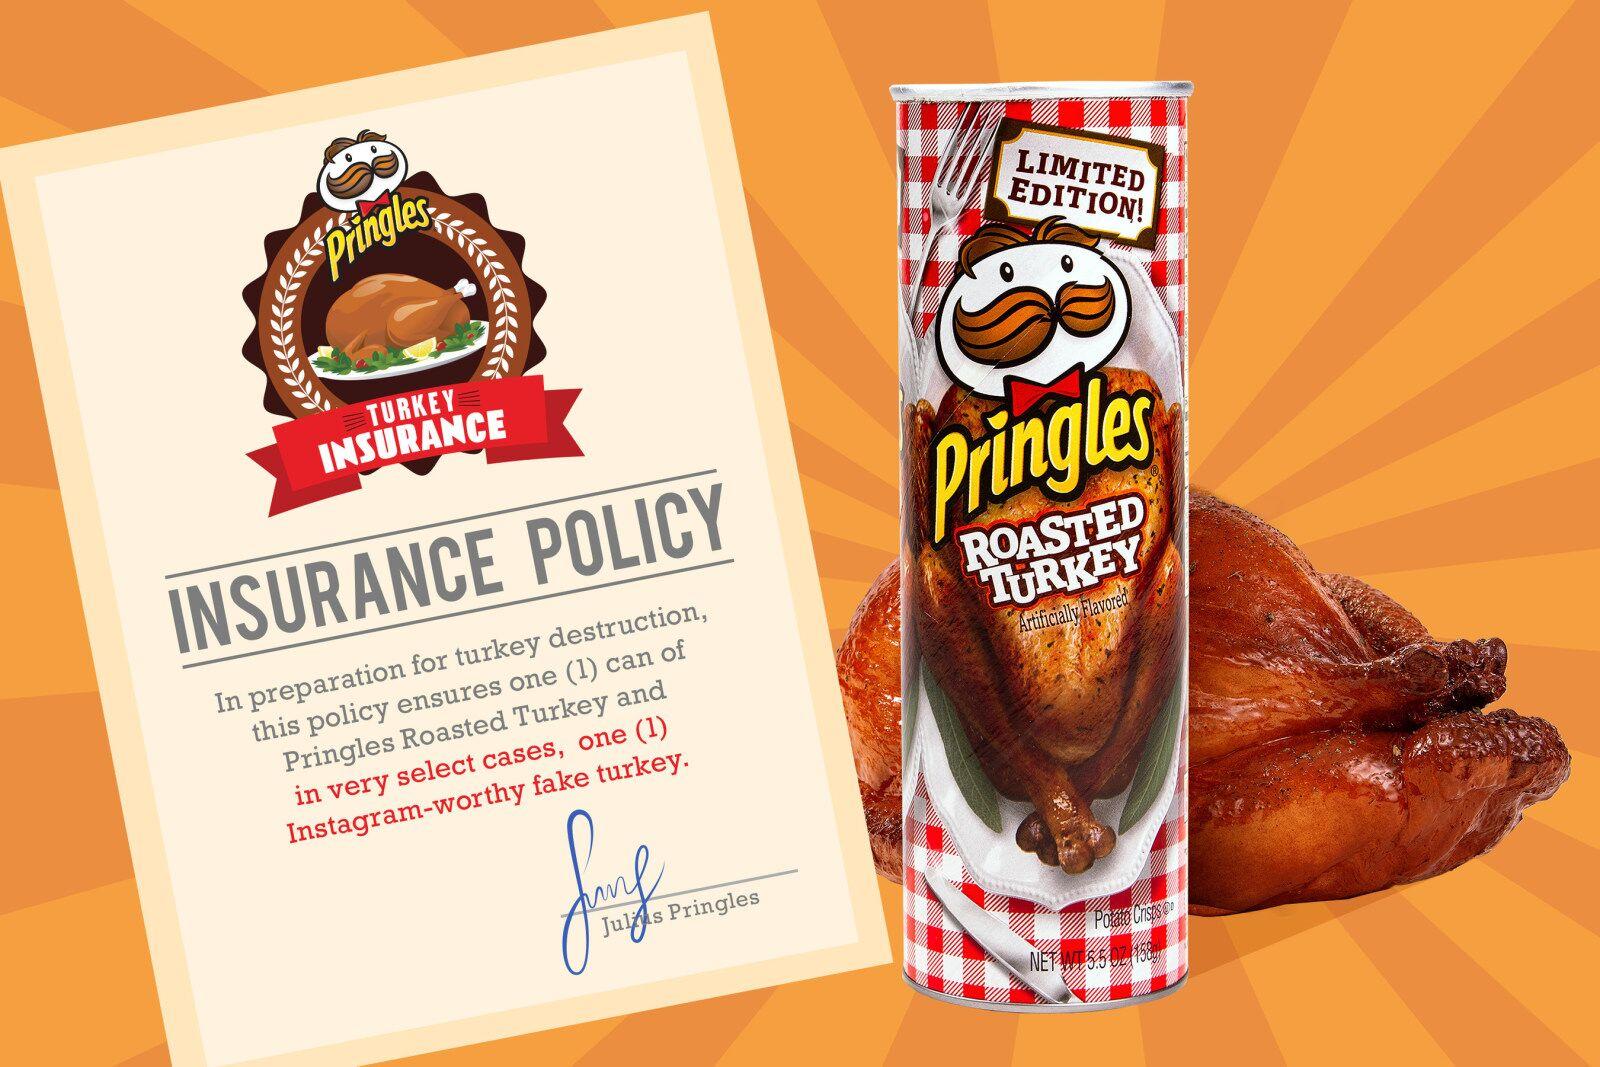 Pringles Roasted Turkey crisps eliminate the Thanksgiving worry